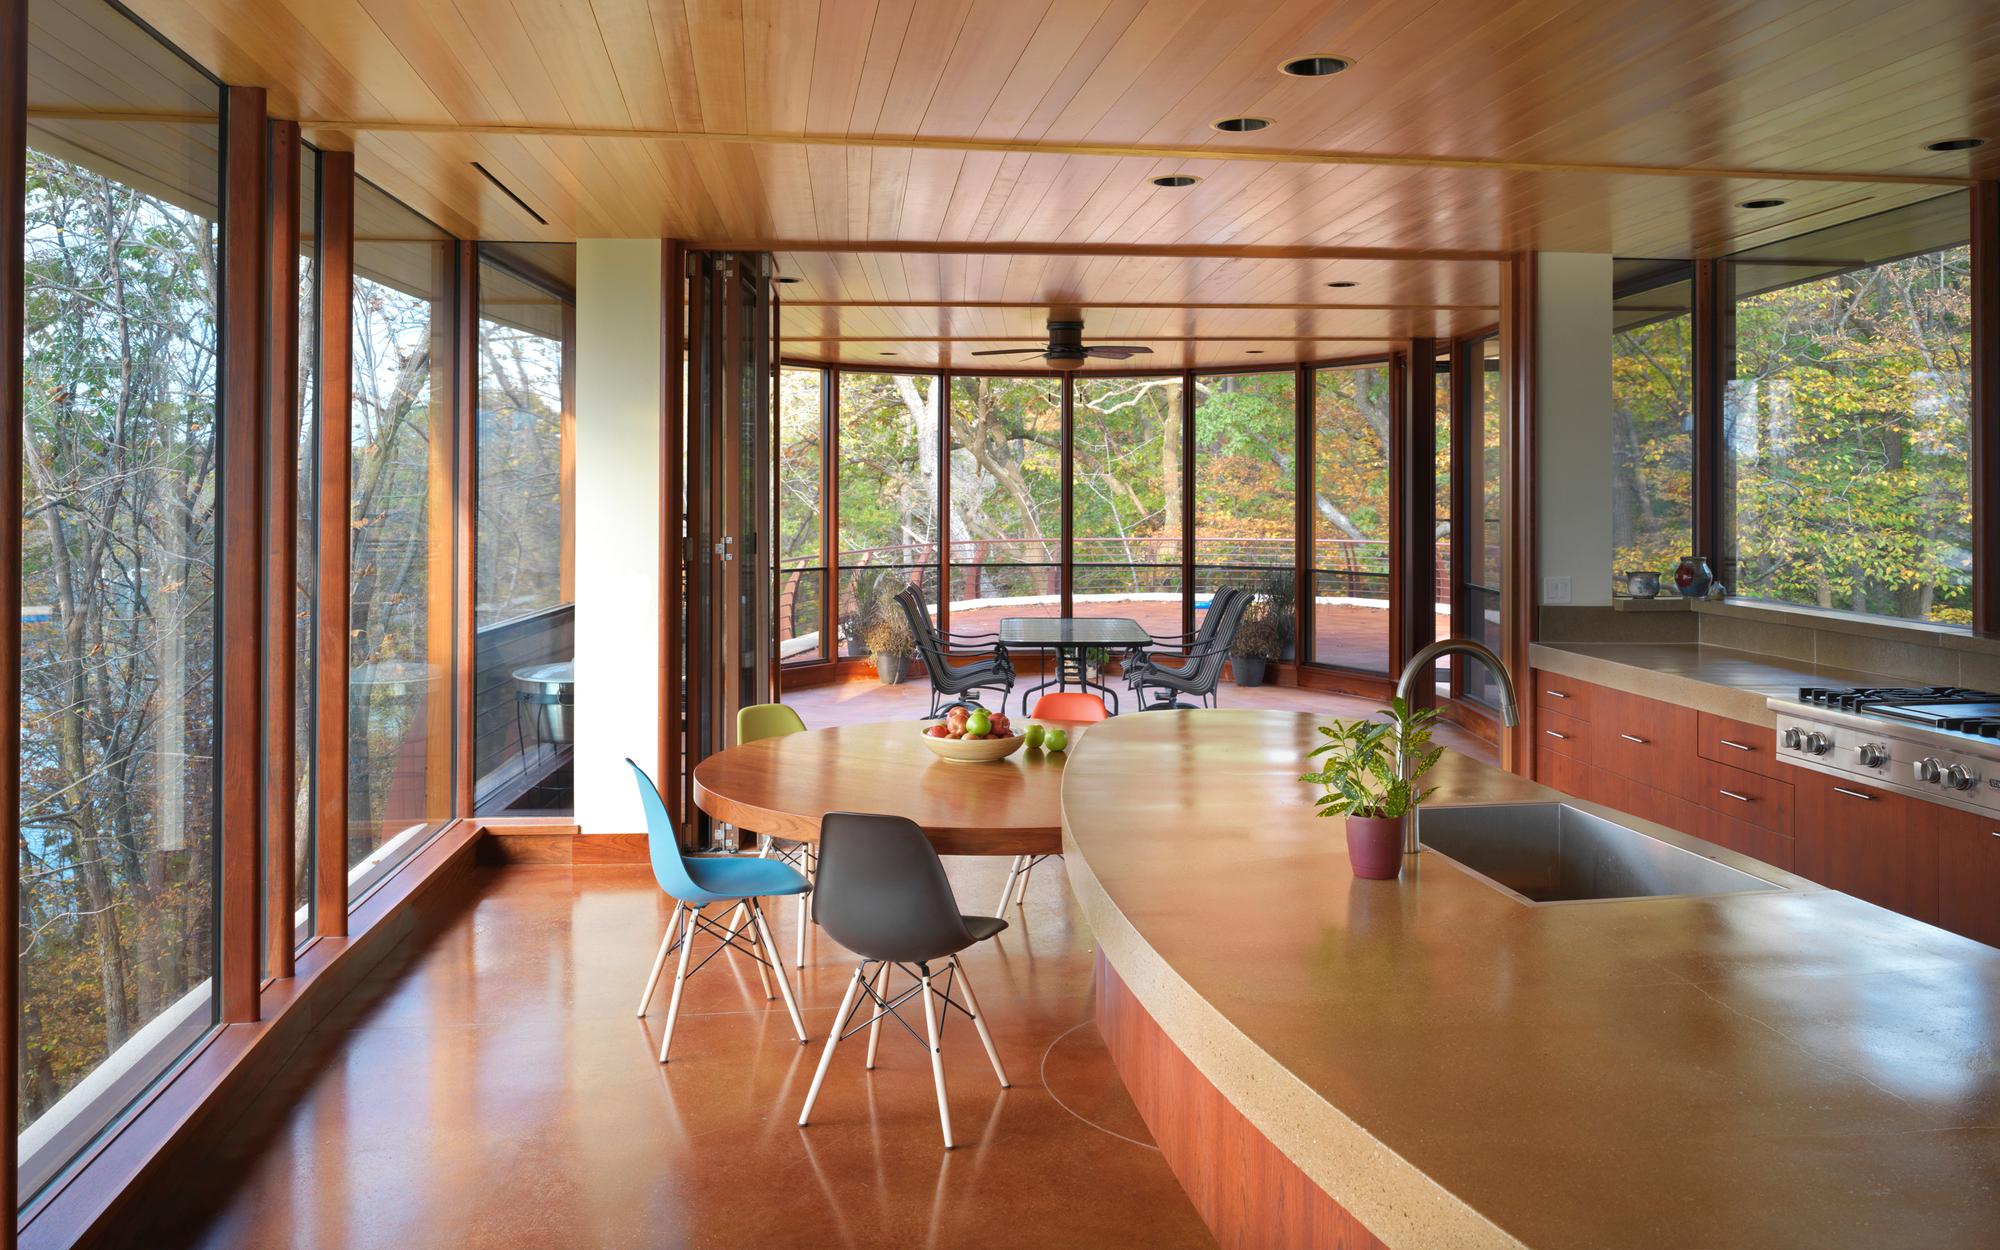 gallery of chenequa residence  robert harvey oshatz architect   - chenequa residence  robert harvey oshatz architect